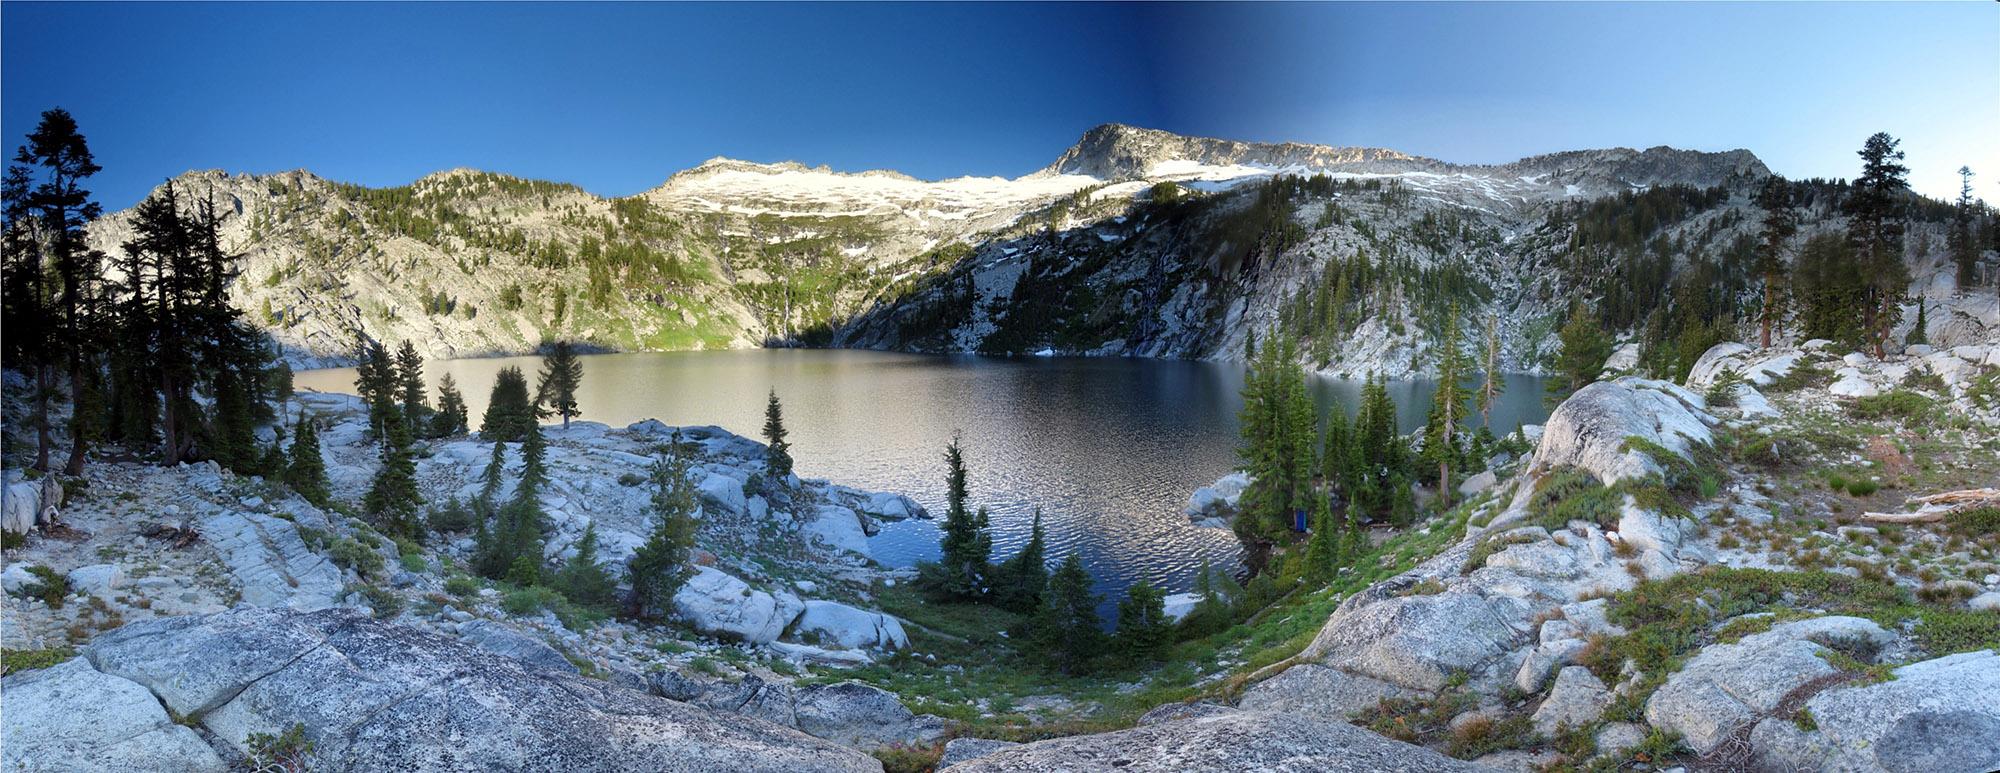 Klamath National Forest - Special Places